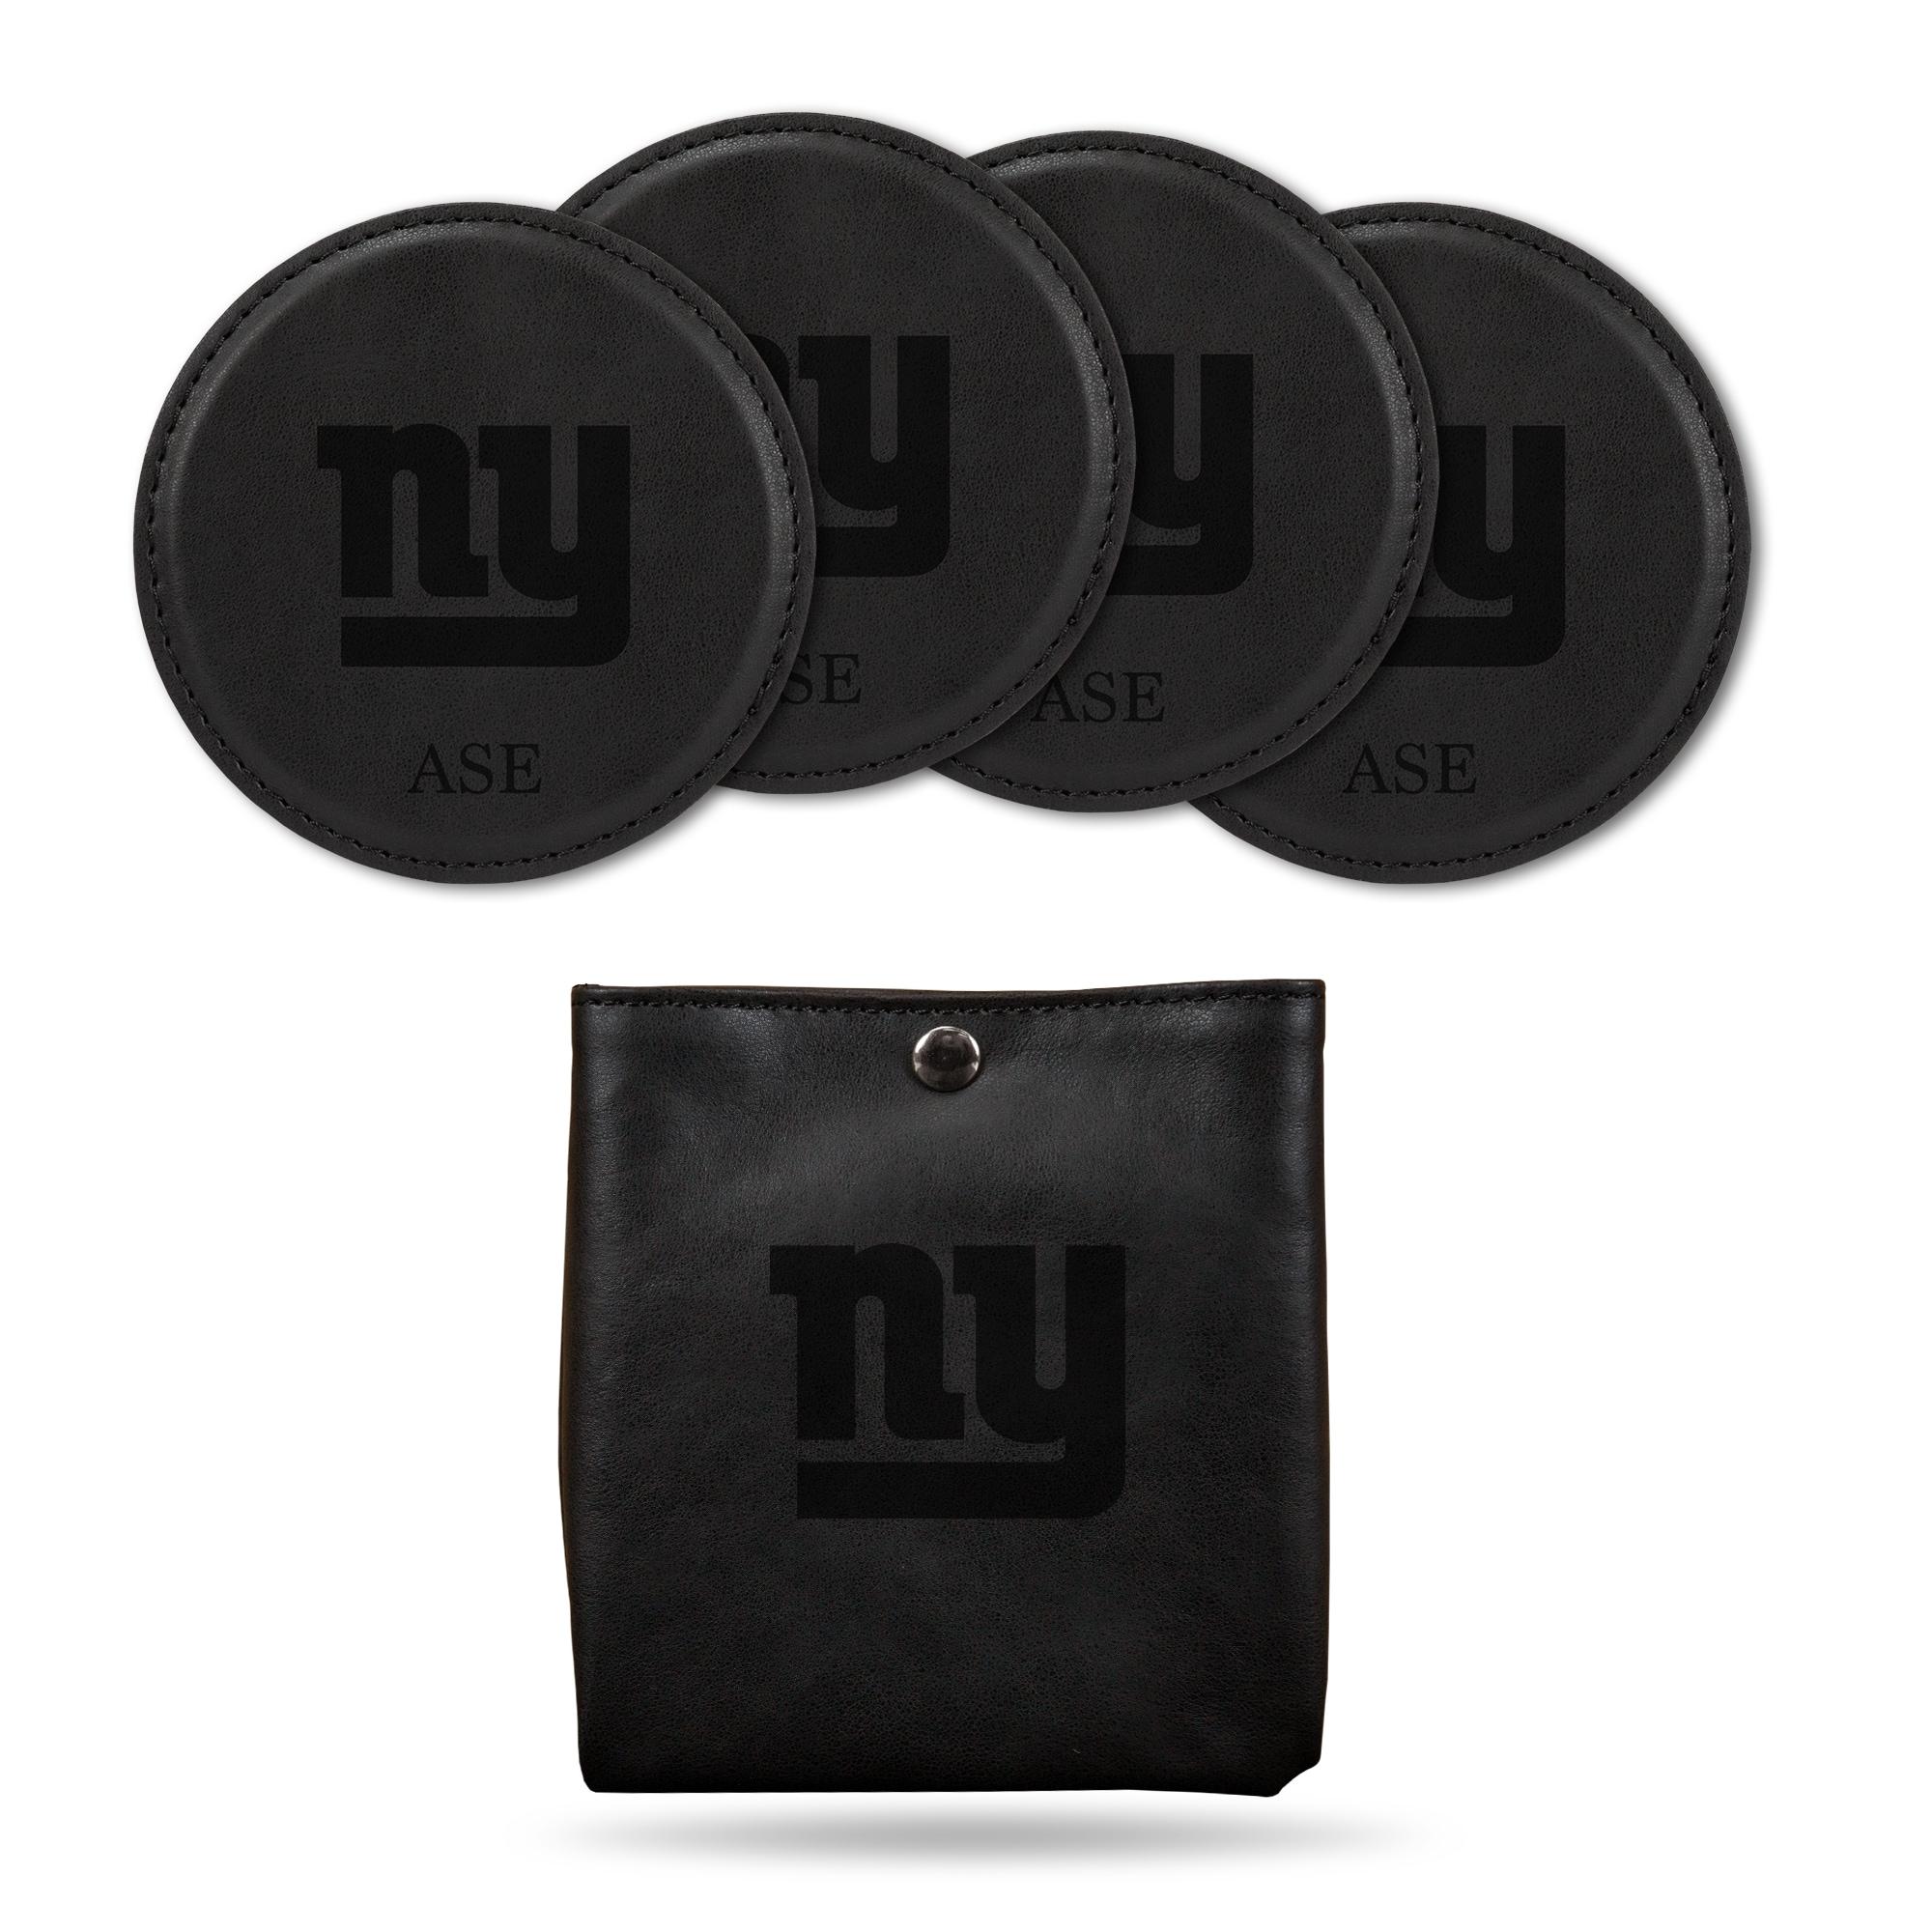 New York Giants Sparo 4-Pack Personalized Coaster Set - Black